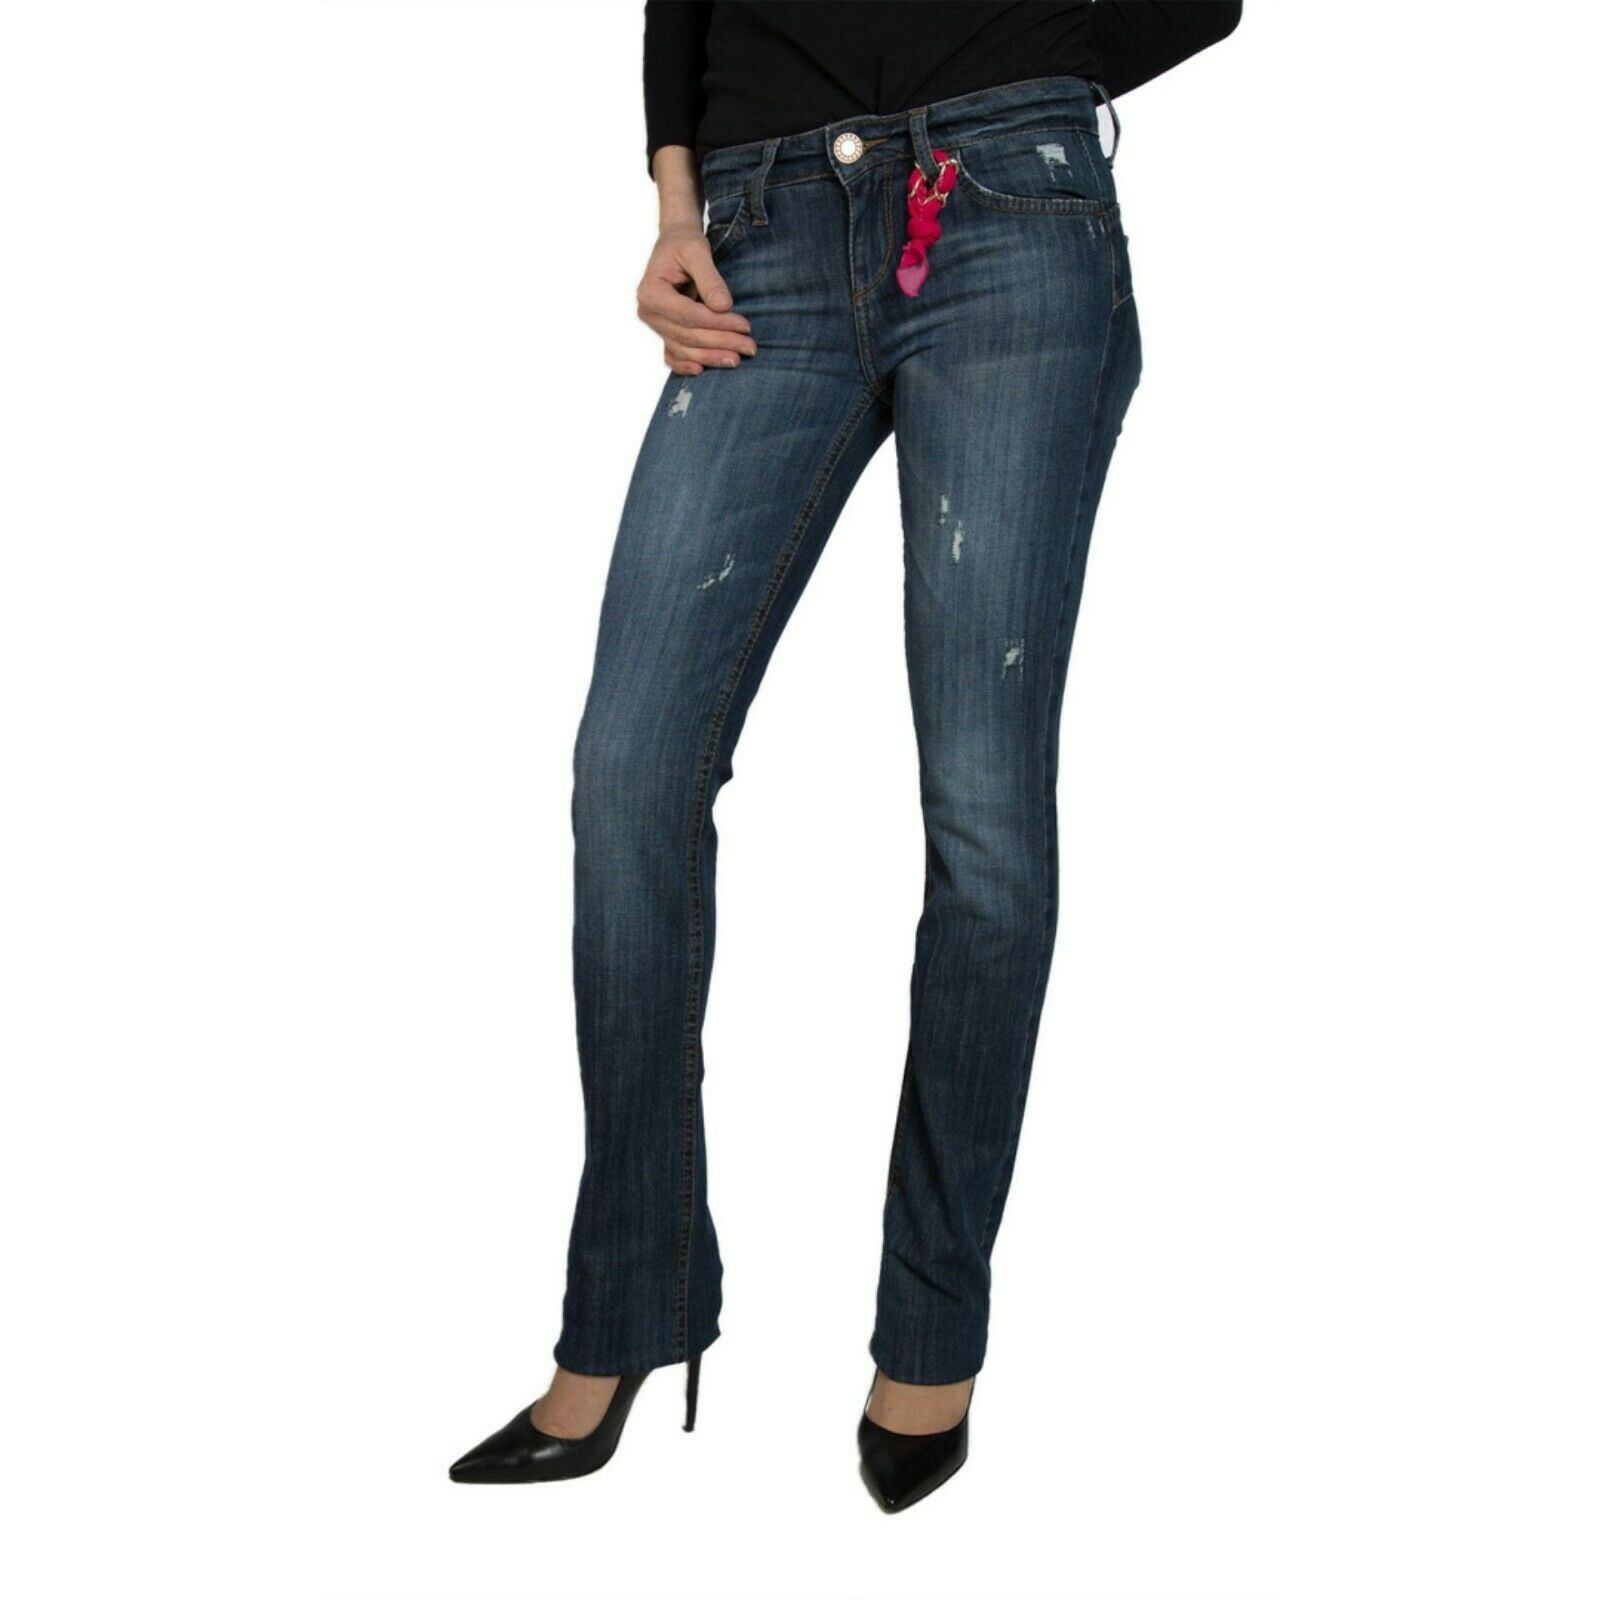 LiuJo Jeans Jeans women Col Denim tg varie   -41 % OCCASIONE